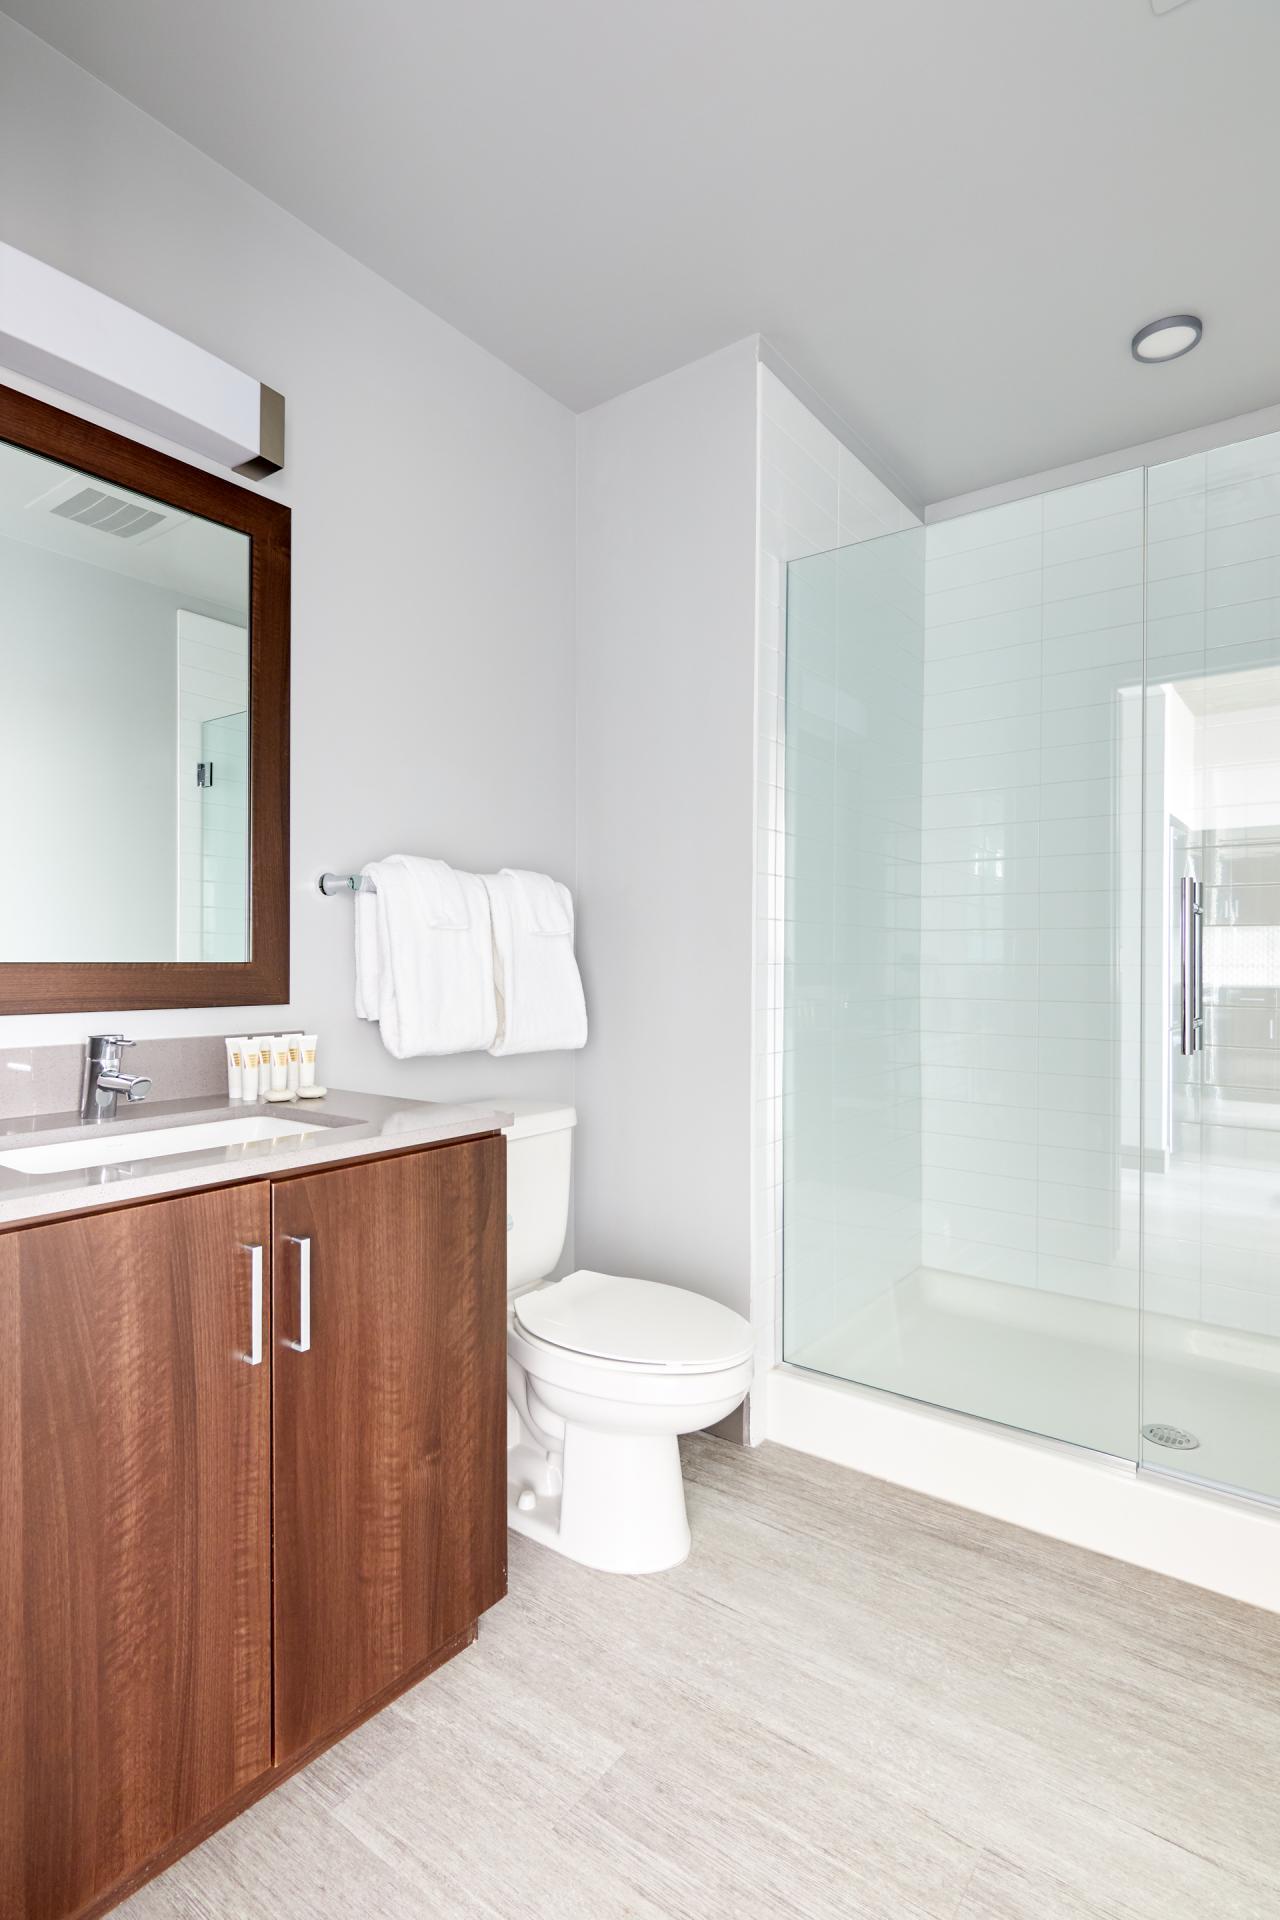 Bathroom at McKinley Apartments, Center, Phoenix